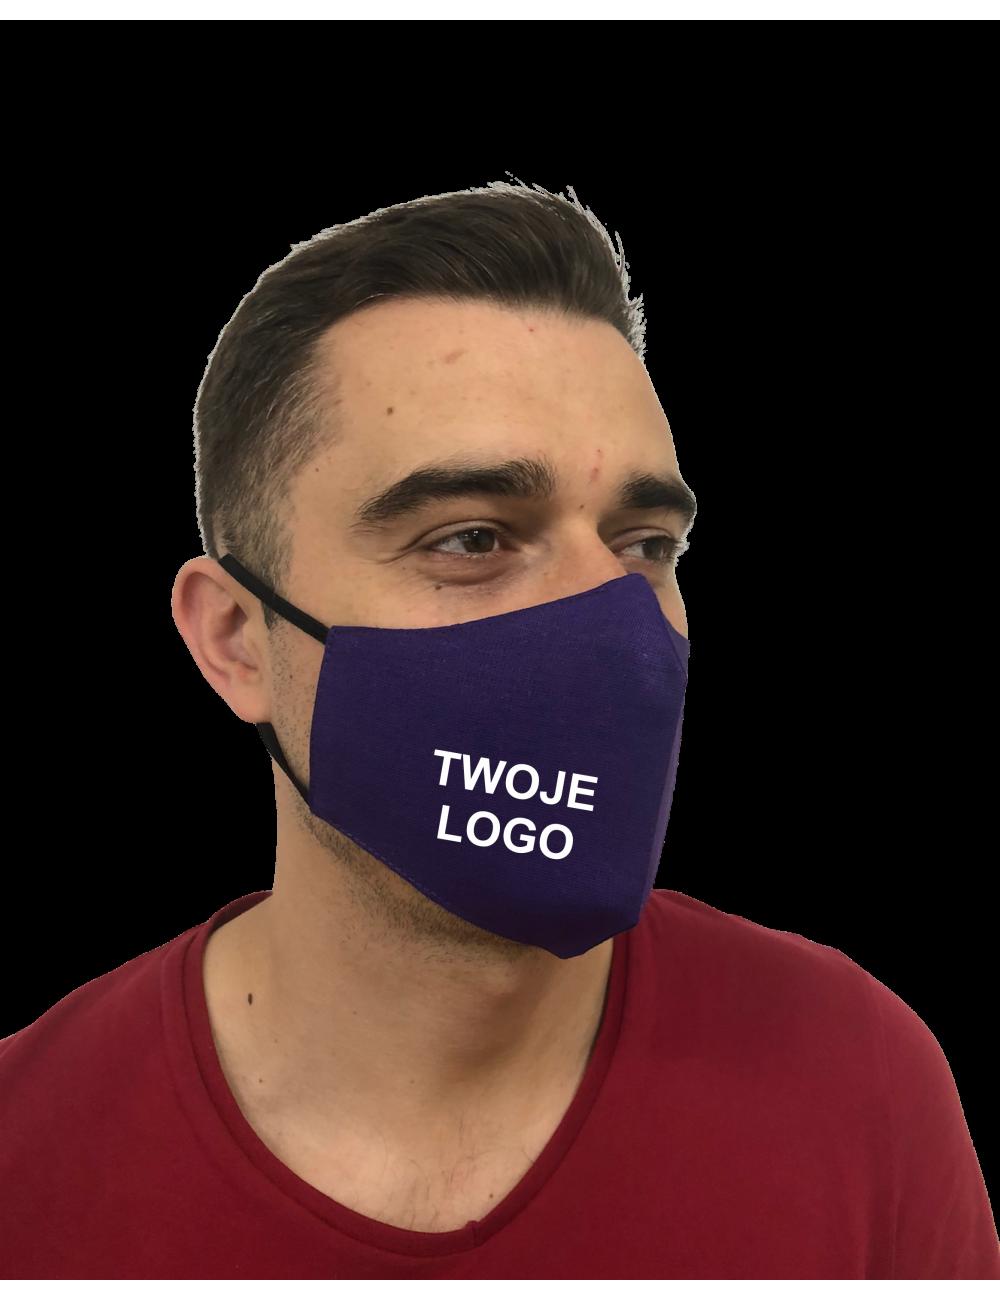 Maska, Maseczka Męska profilowana bawełniana fioletowa z twoim logo full color